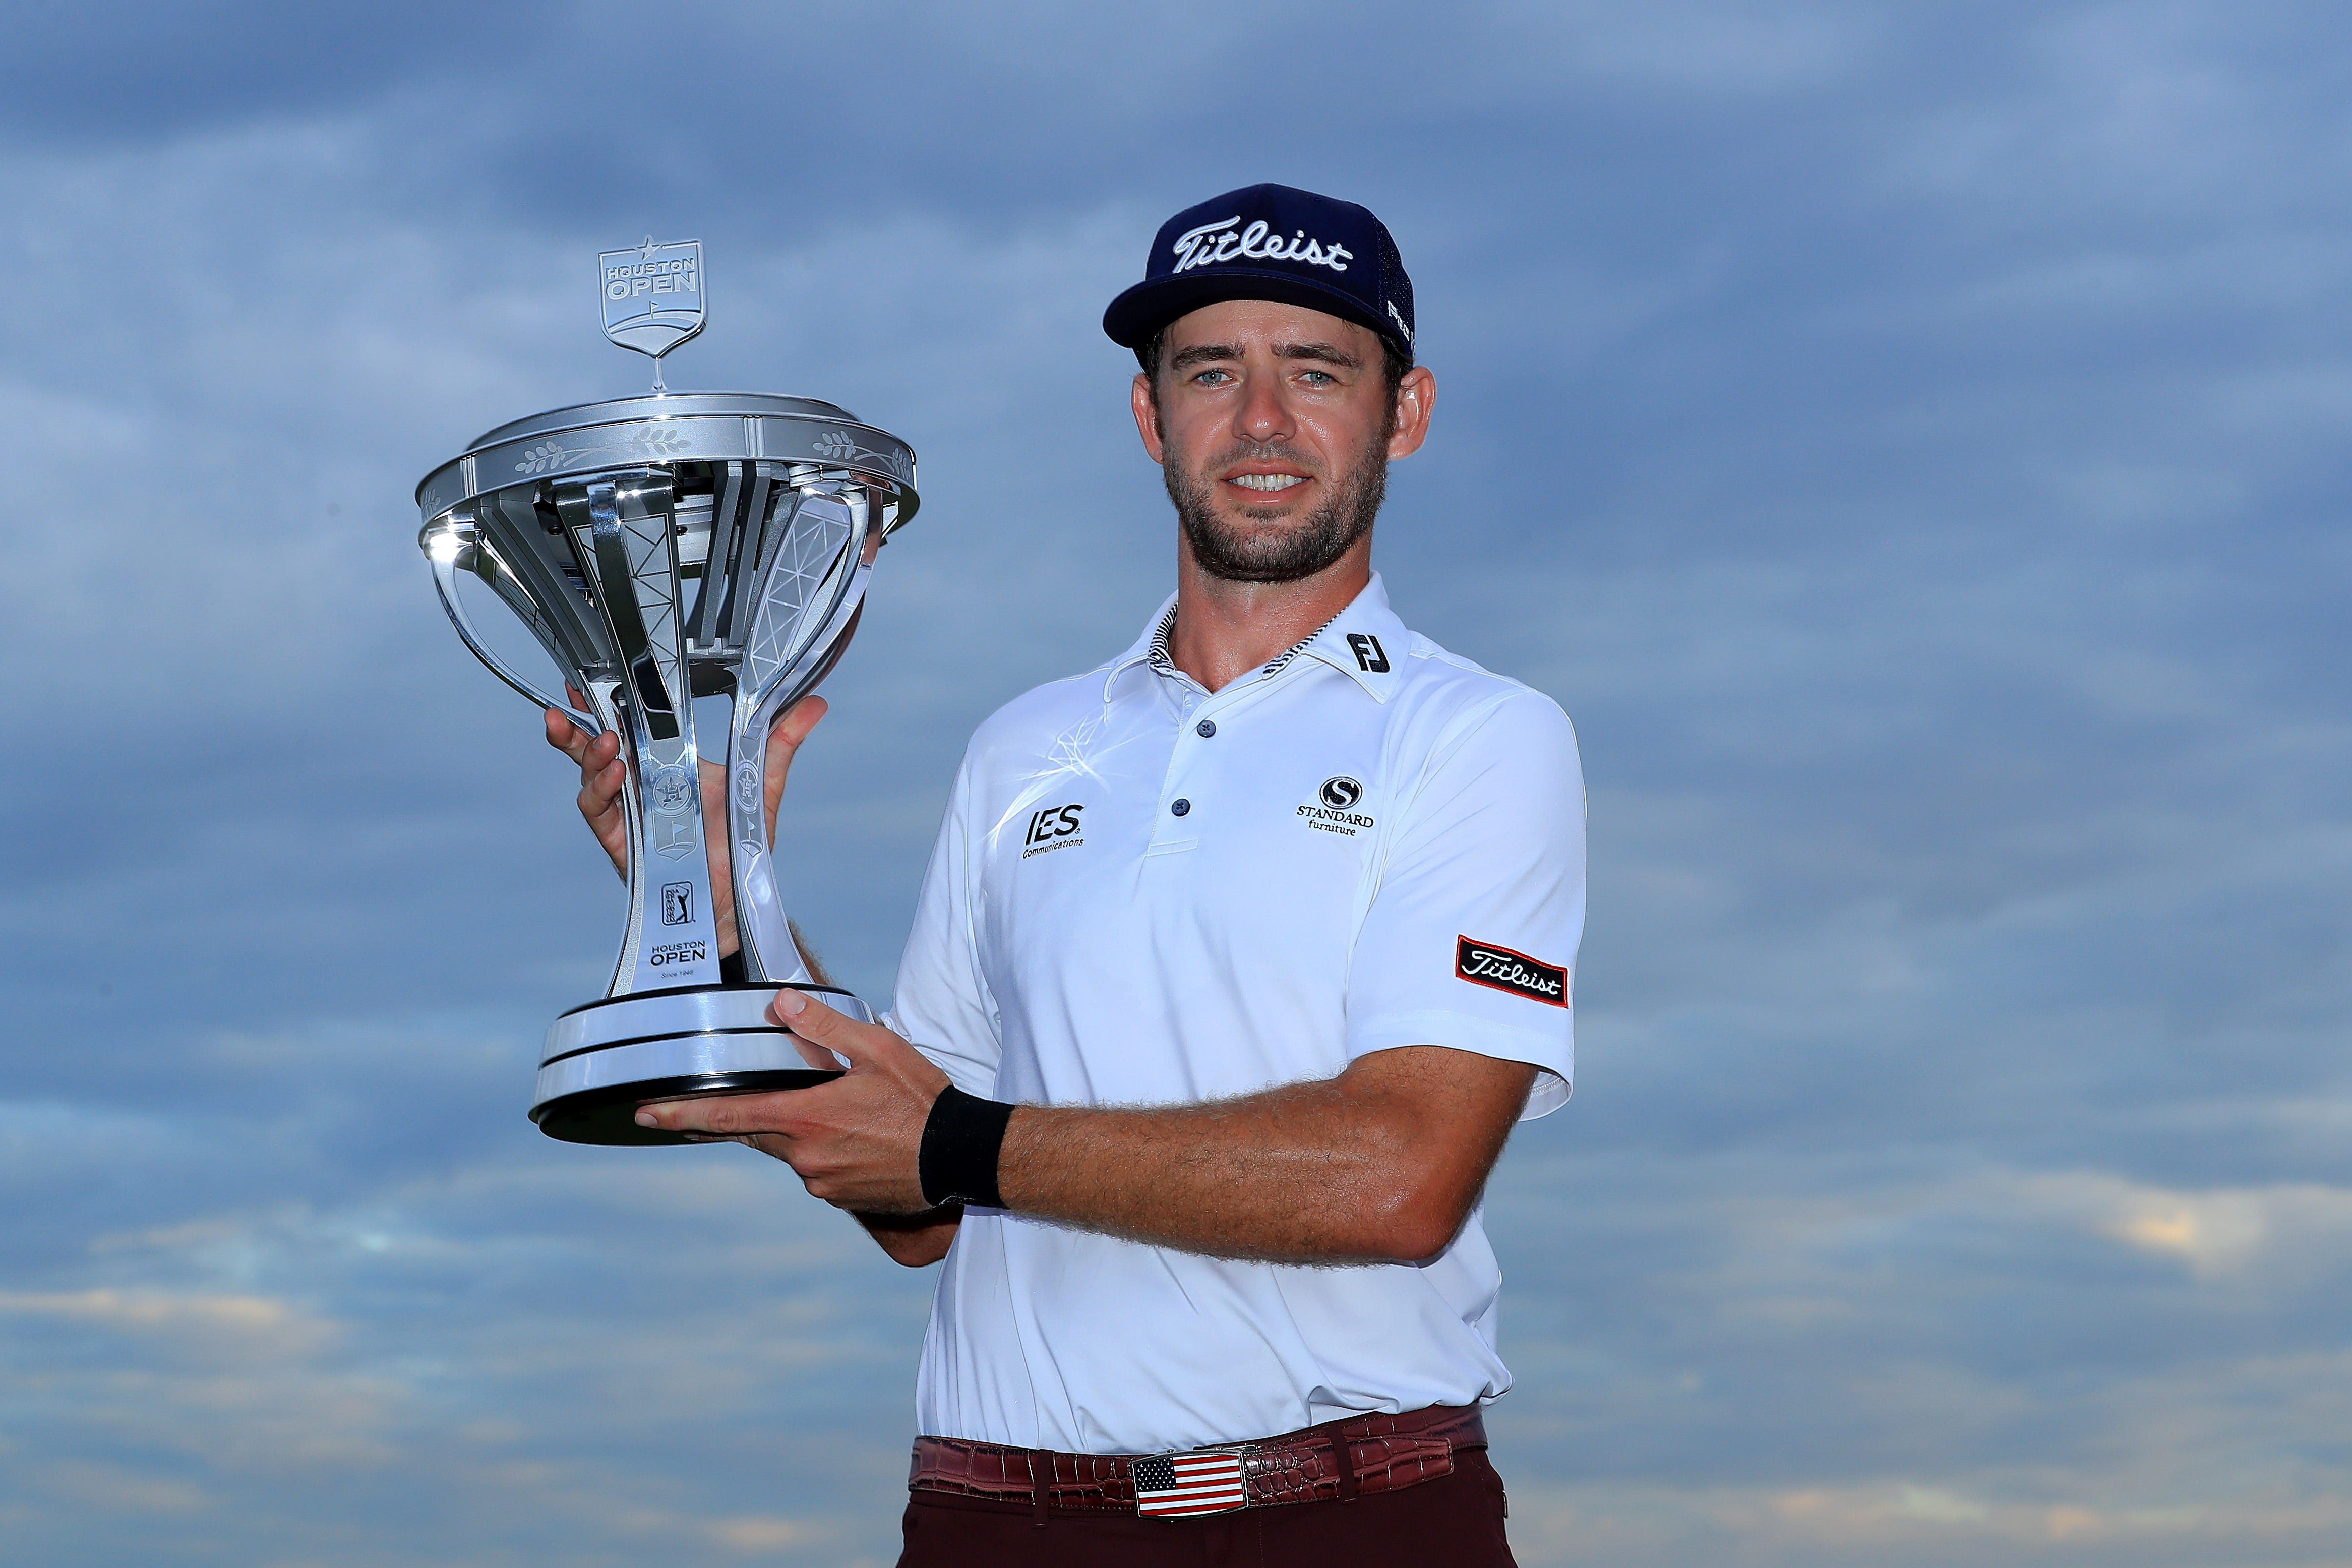 2019-20 PGA Tour tournament winners